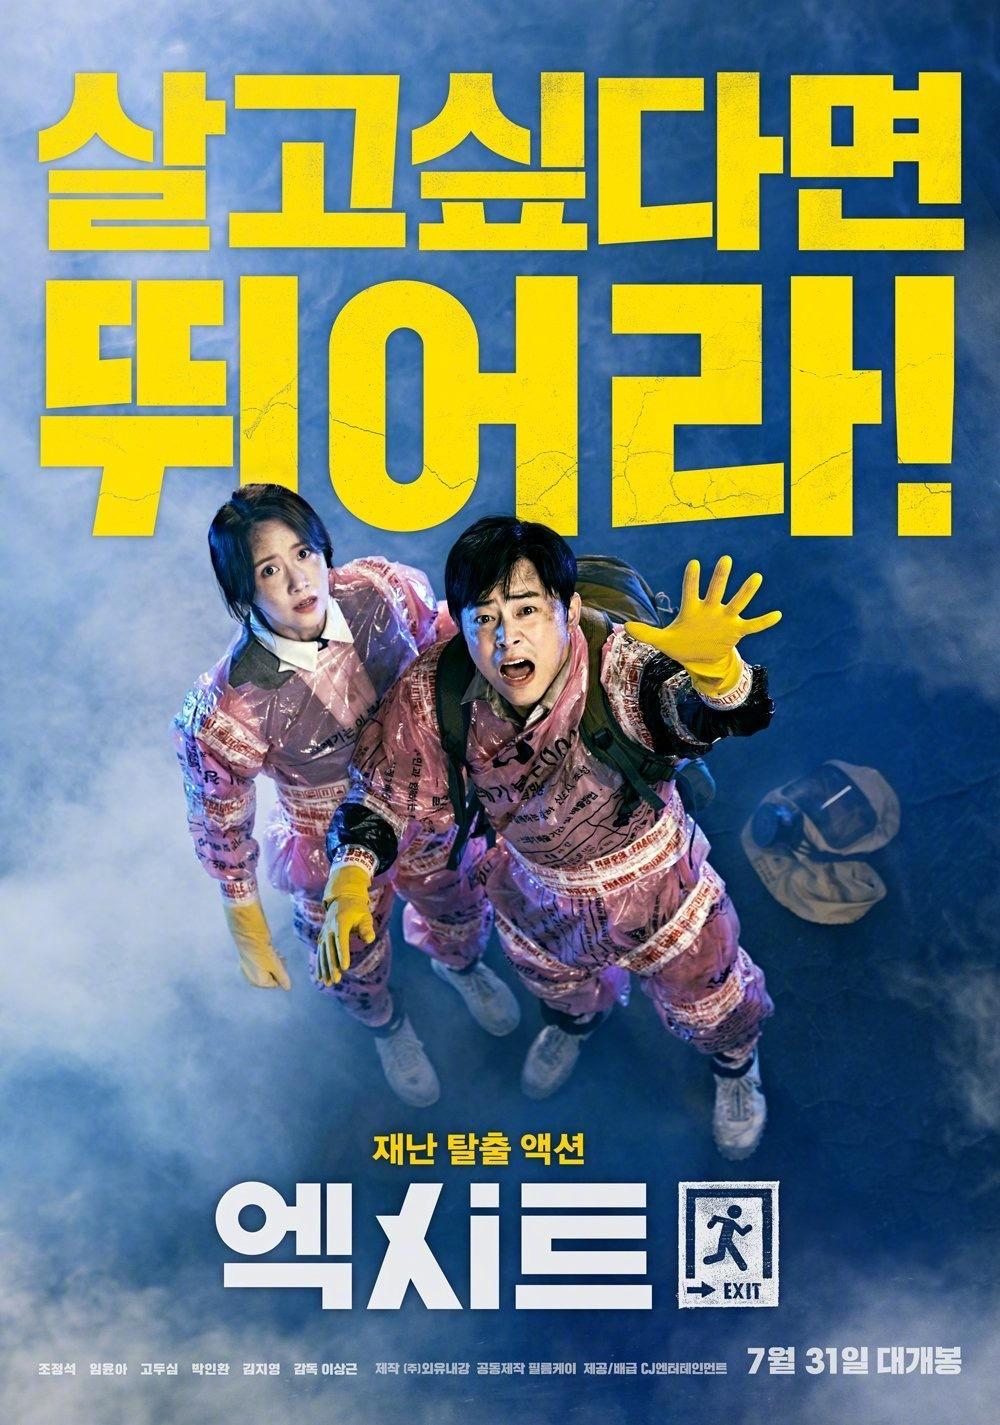 悠悠MP4_MP4电影下载_极限逃生 Exit.2019.KOREAN.1080p.BluRay.x264.DTS-CHD 11.47GB